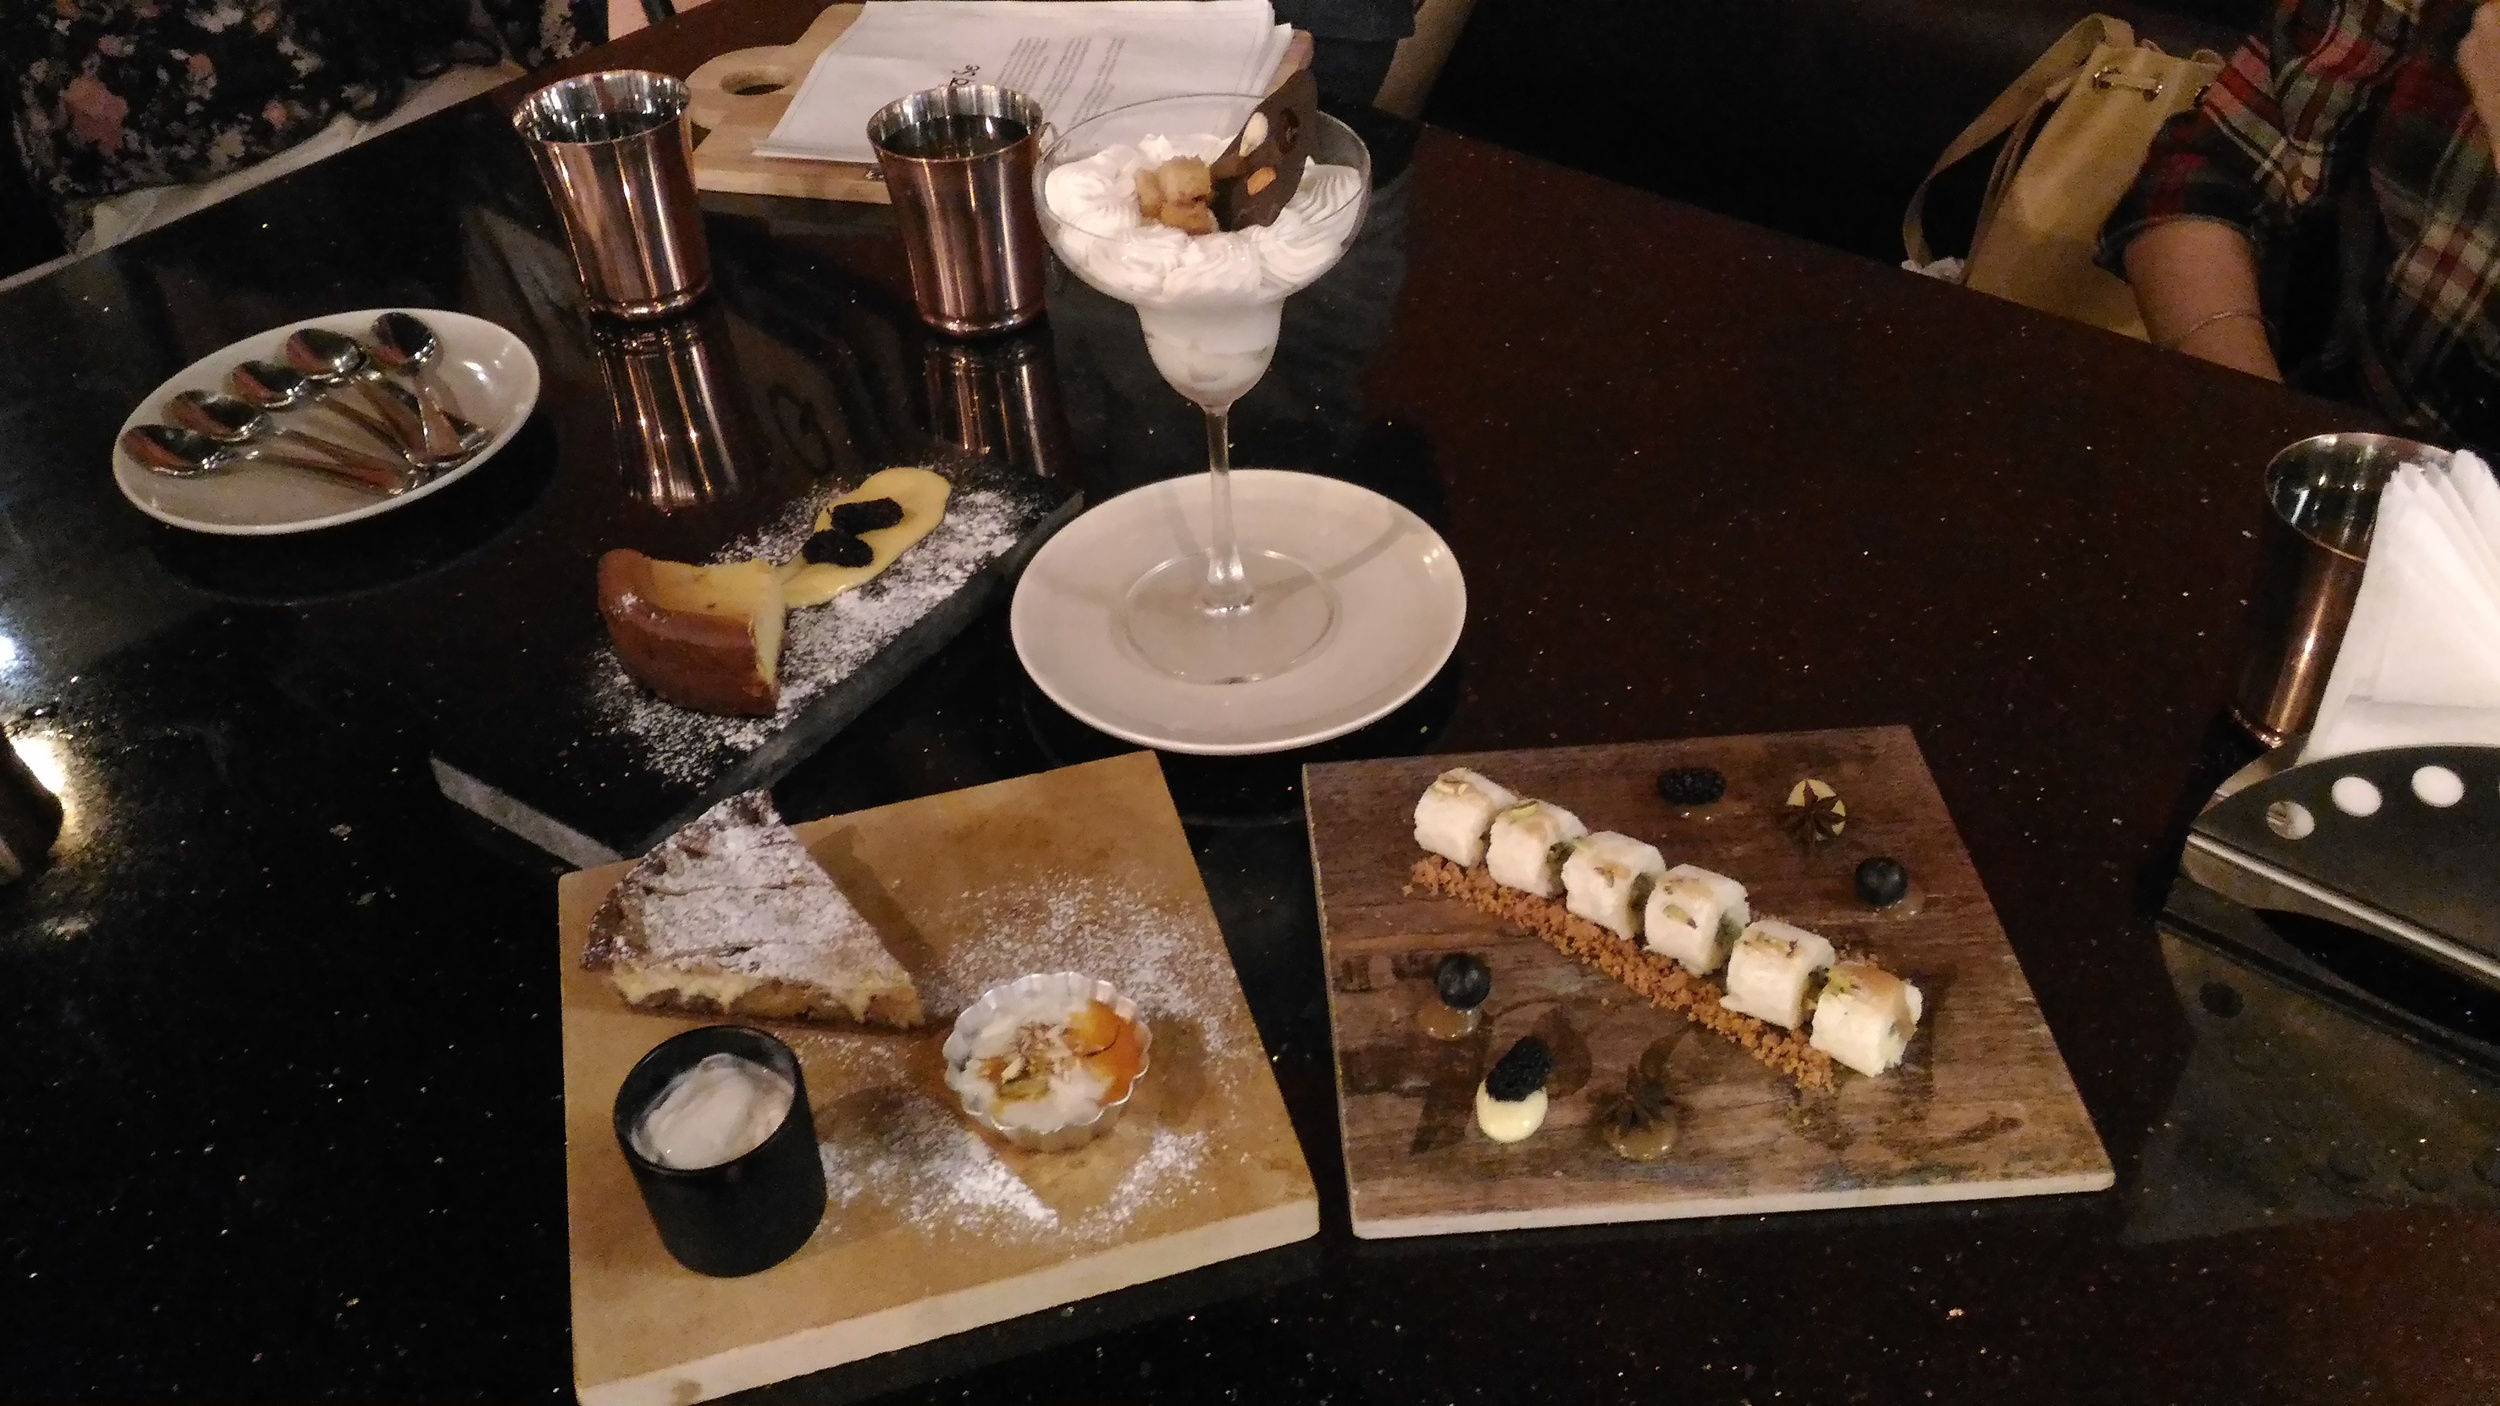 desserts @ Cafe haqq se